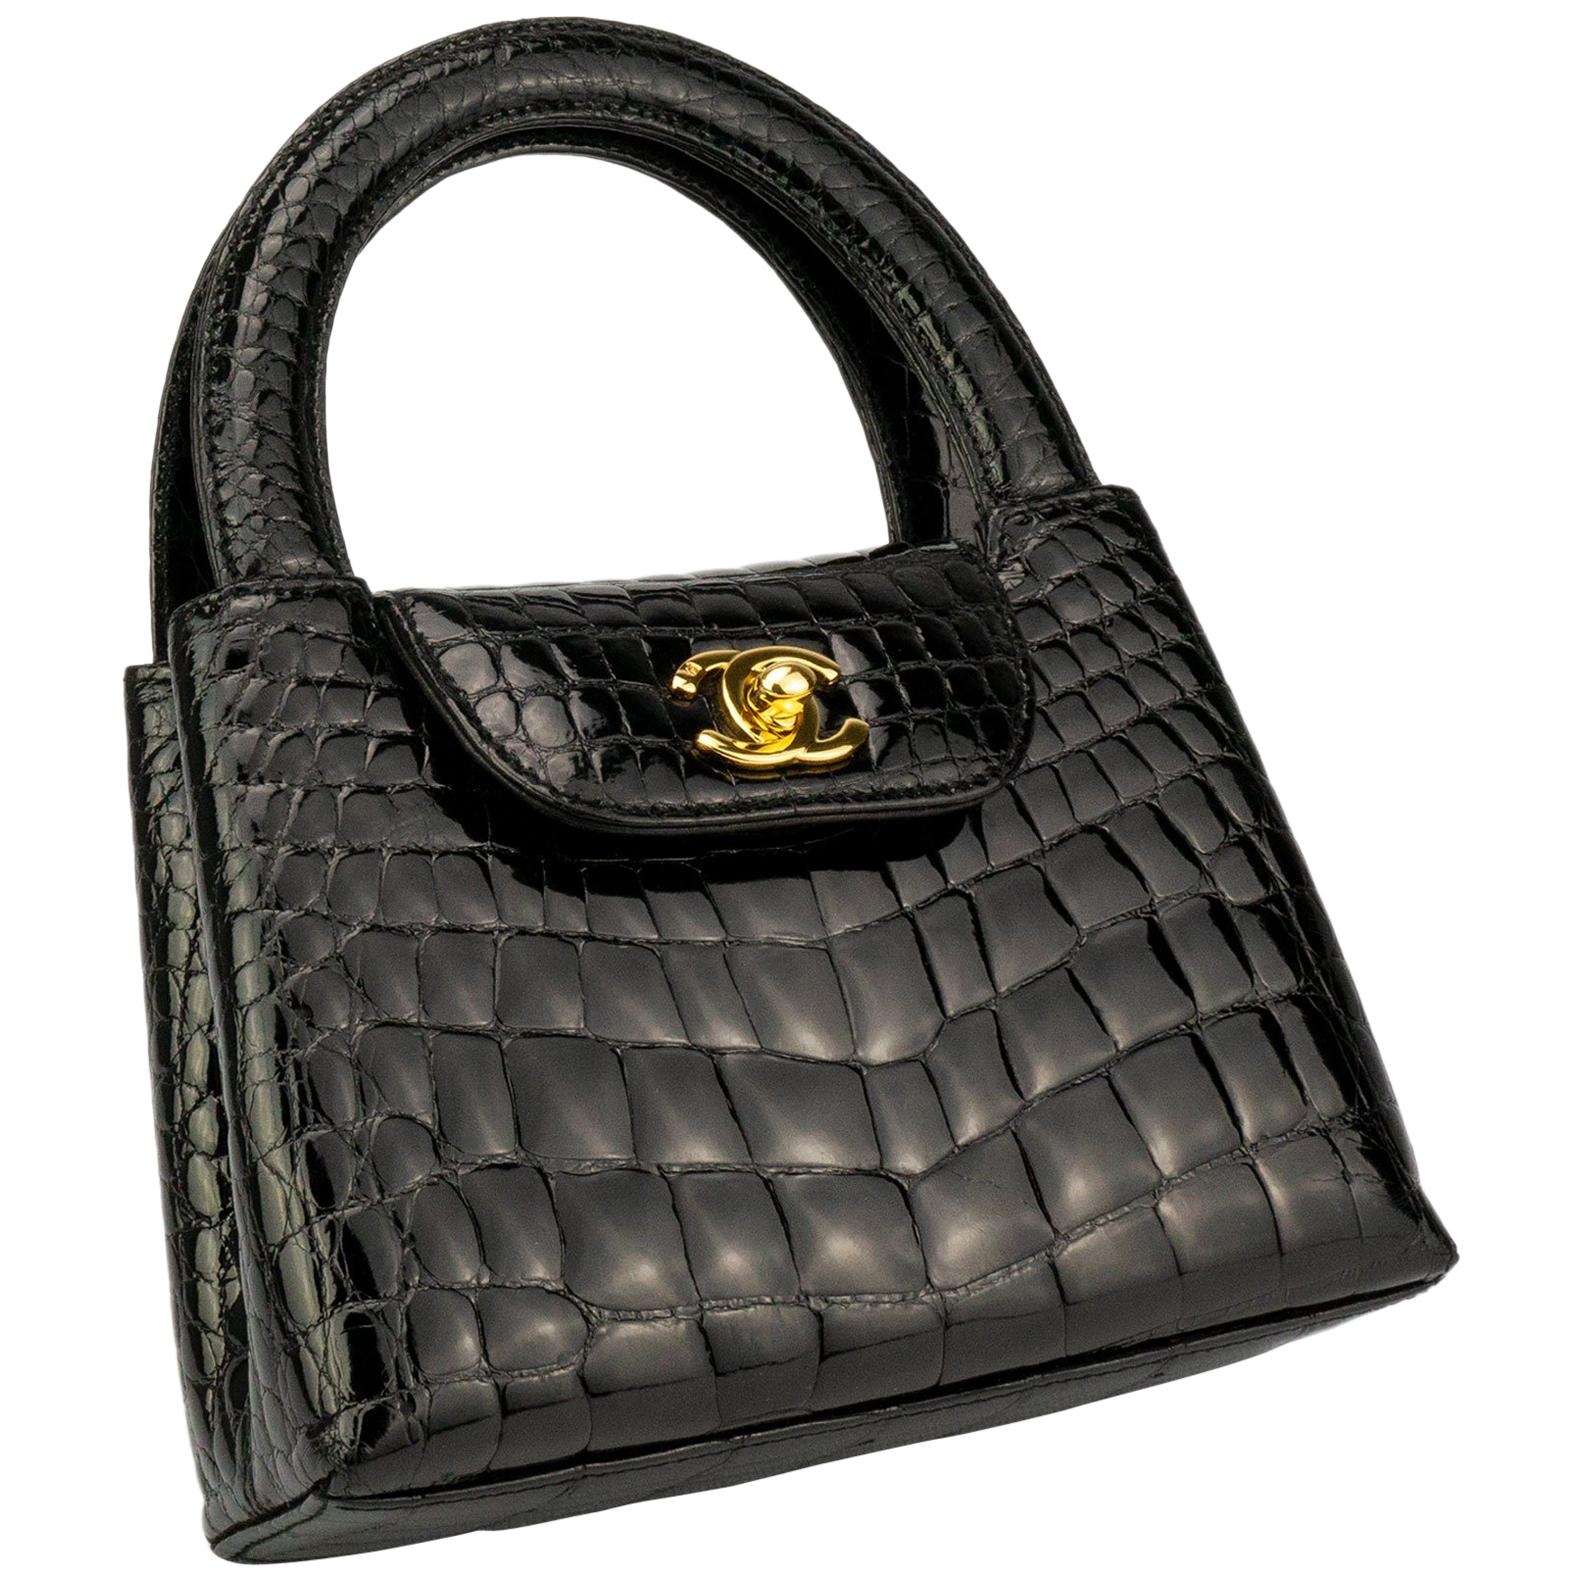 Chanel Black Crocodile Vintage Mini Teeny Tiny Kelly Clutch Alligator Tote Bag